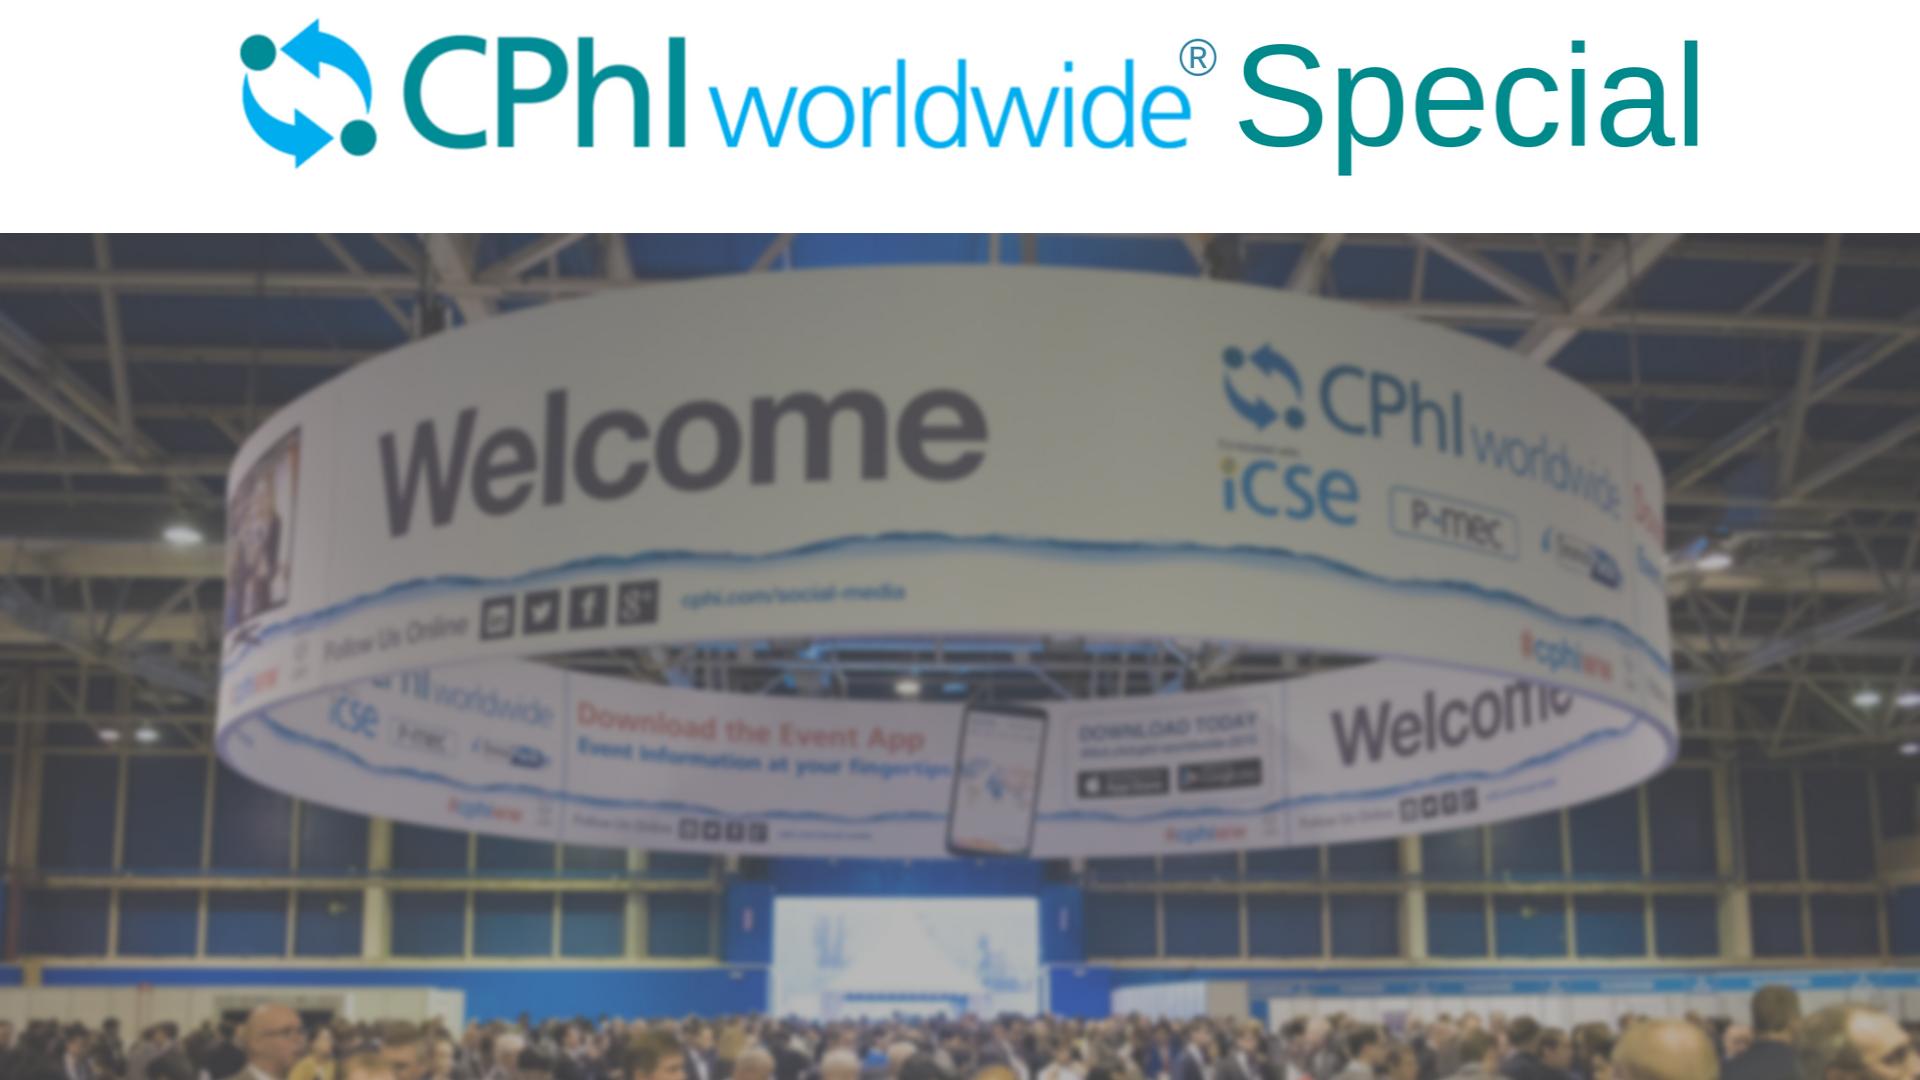 Cphi Worldwide 2019 Pharma Excipients